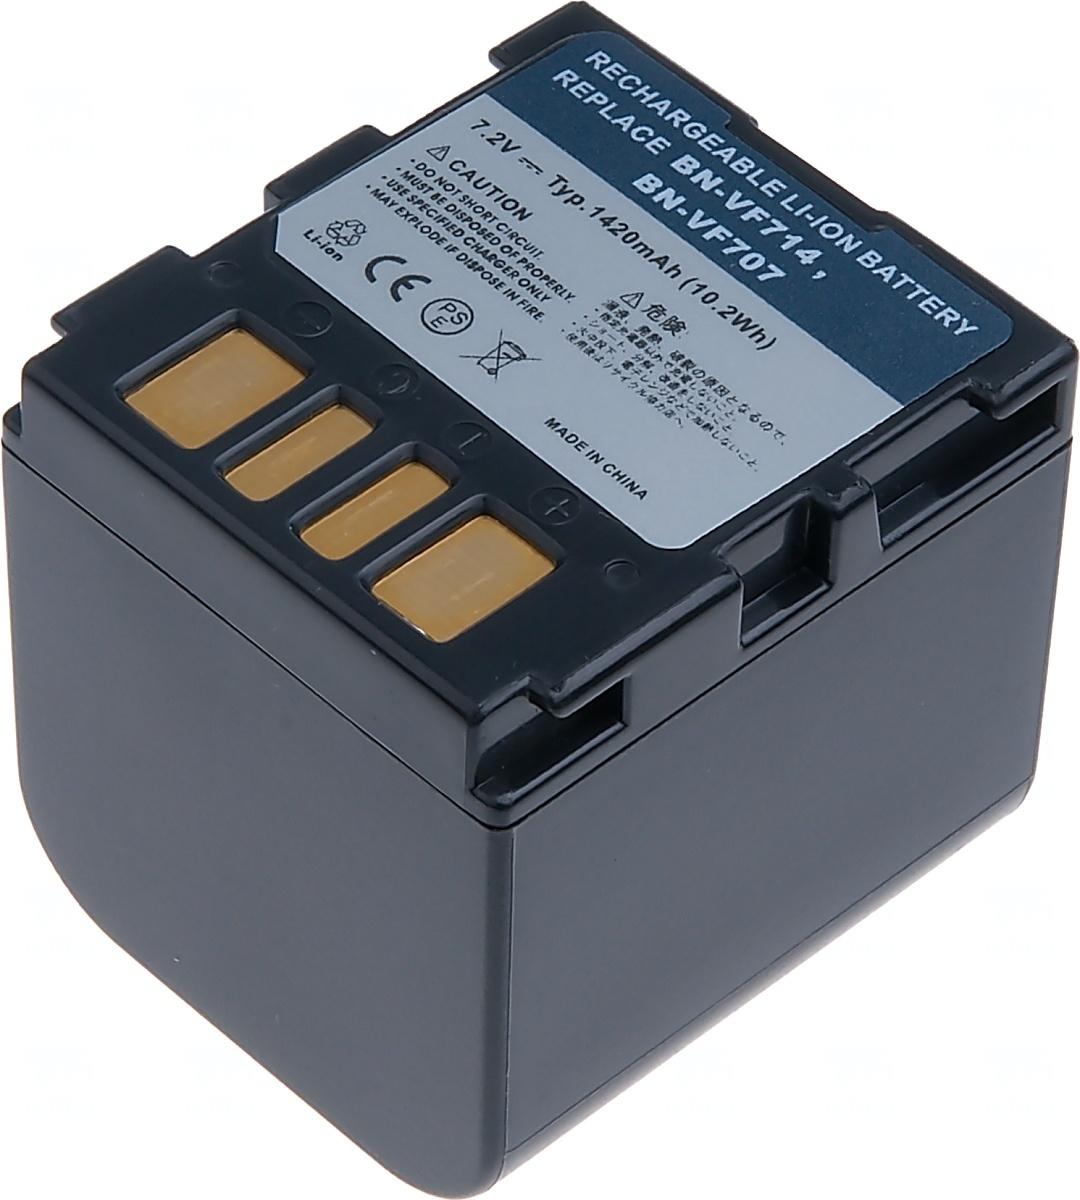 Baterie T6 power JVC BN-VF707U, BN-VF707, BN-VF714, 1420mAh, šedá